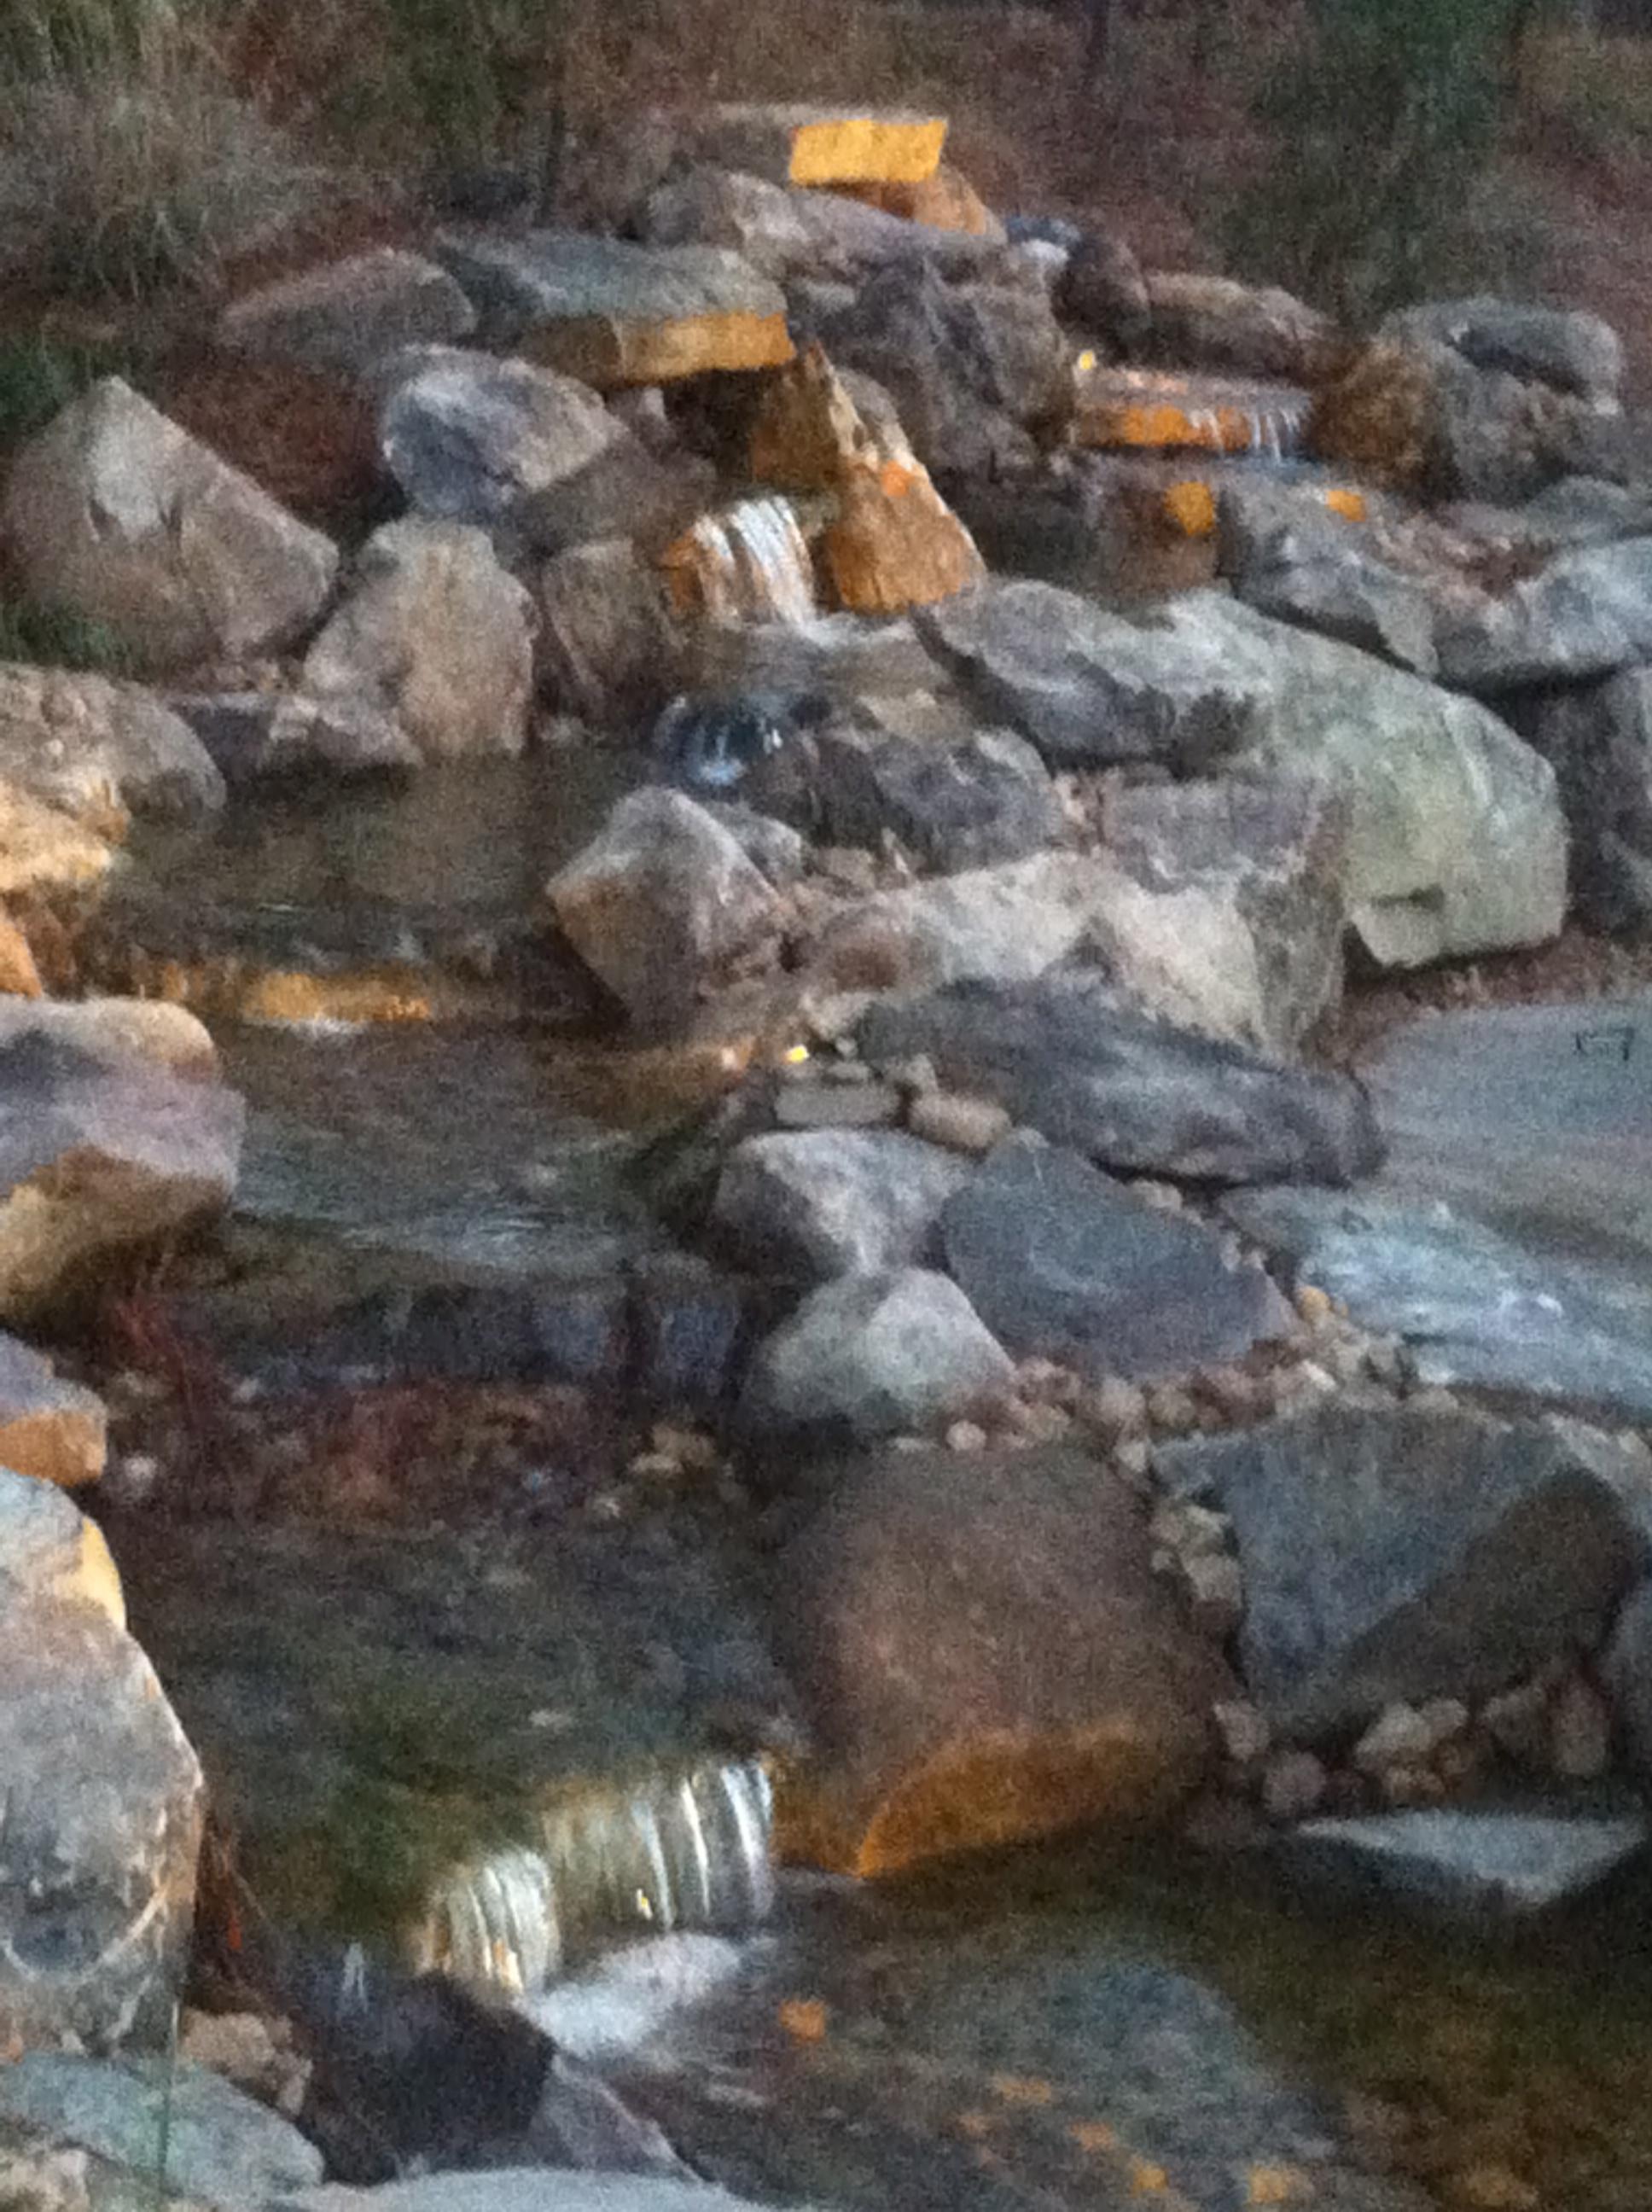 Boulder lined pondless stream